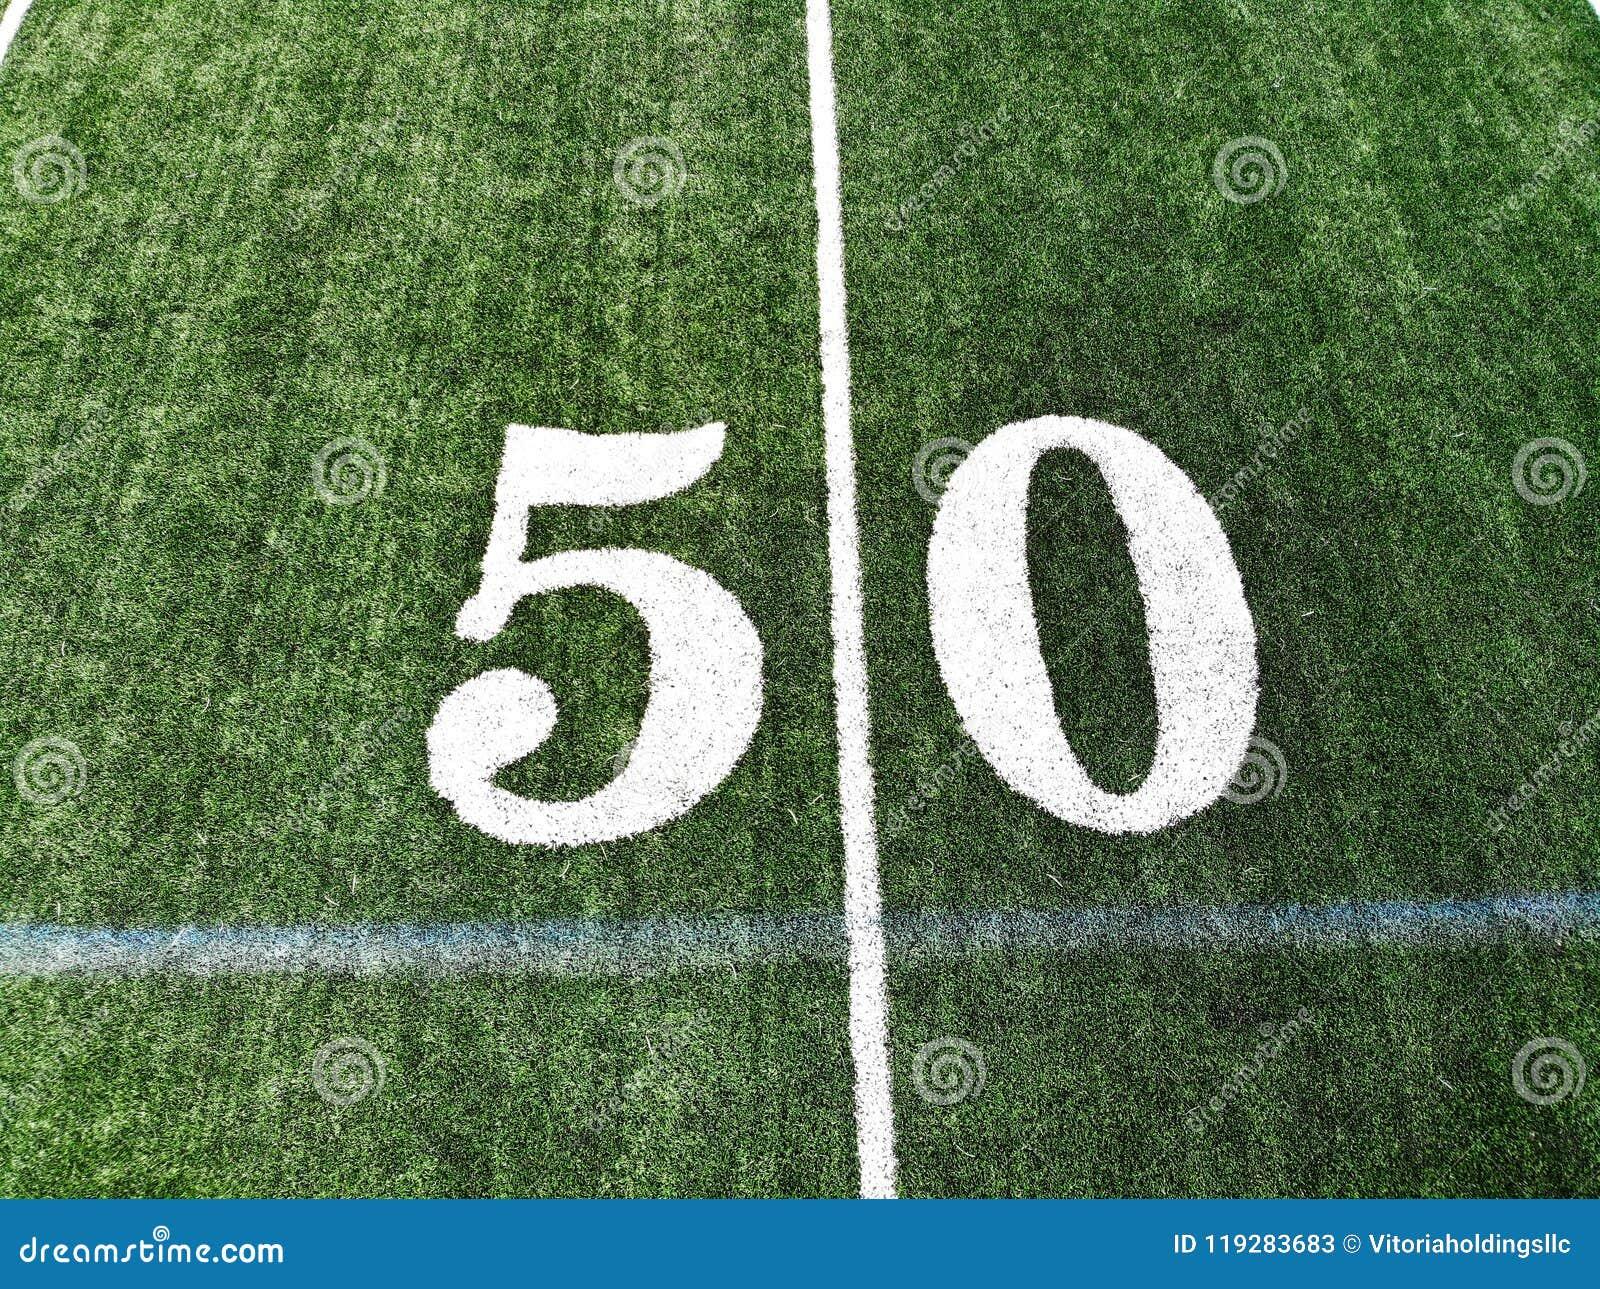 Tiro do zangão do campo de Mark On An American Football de 50 jardas